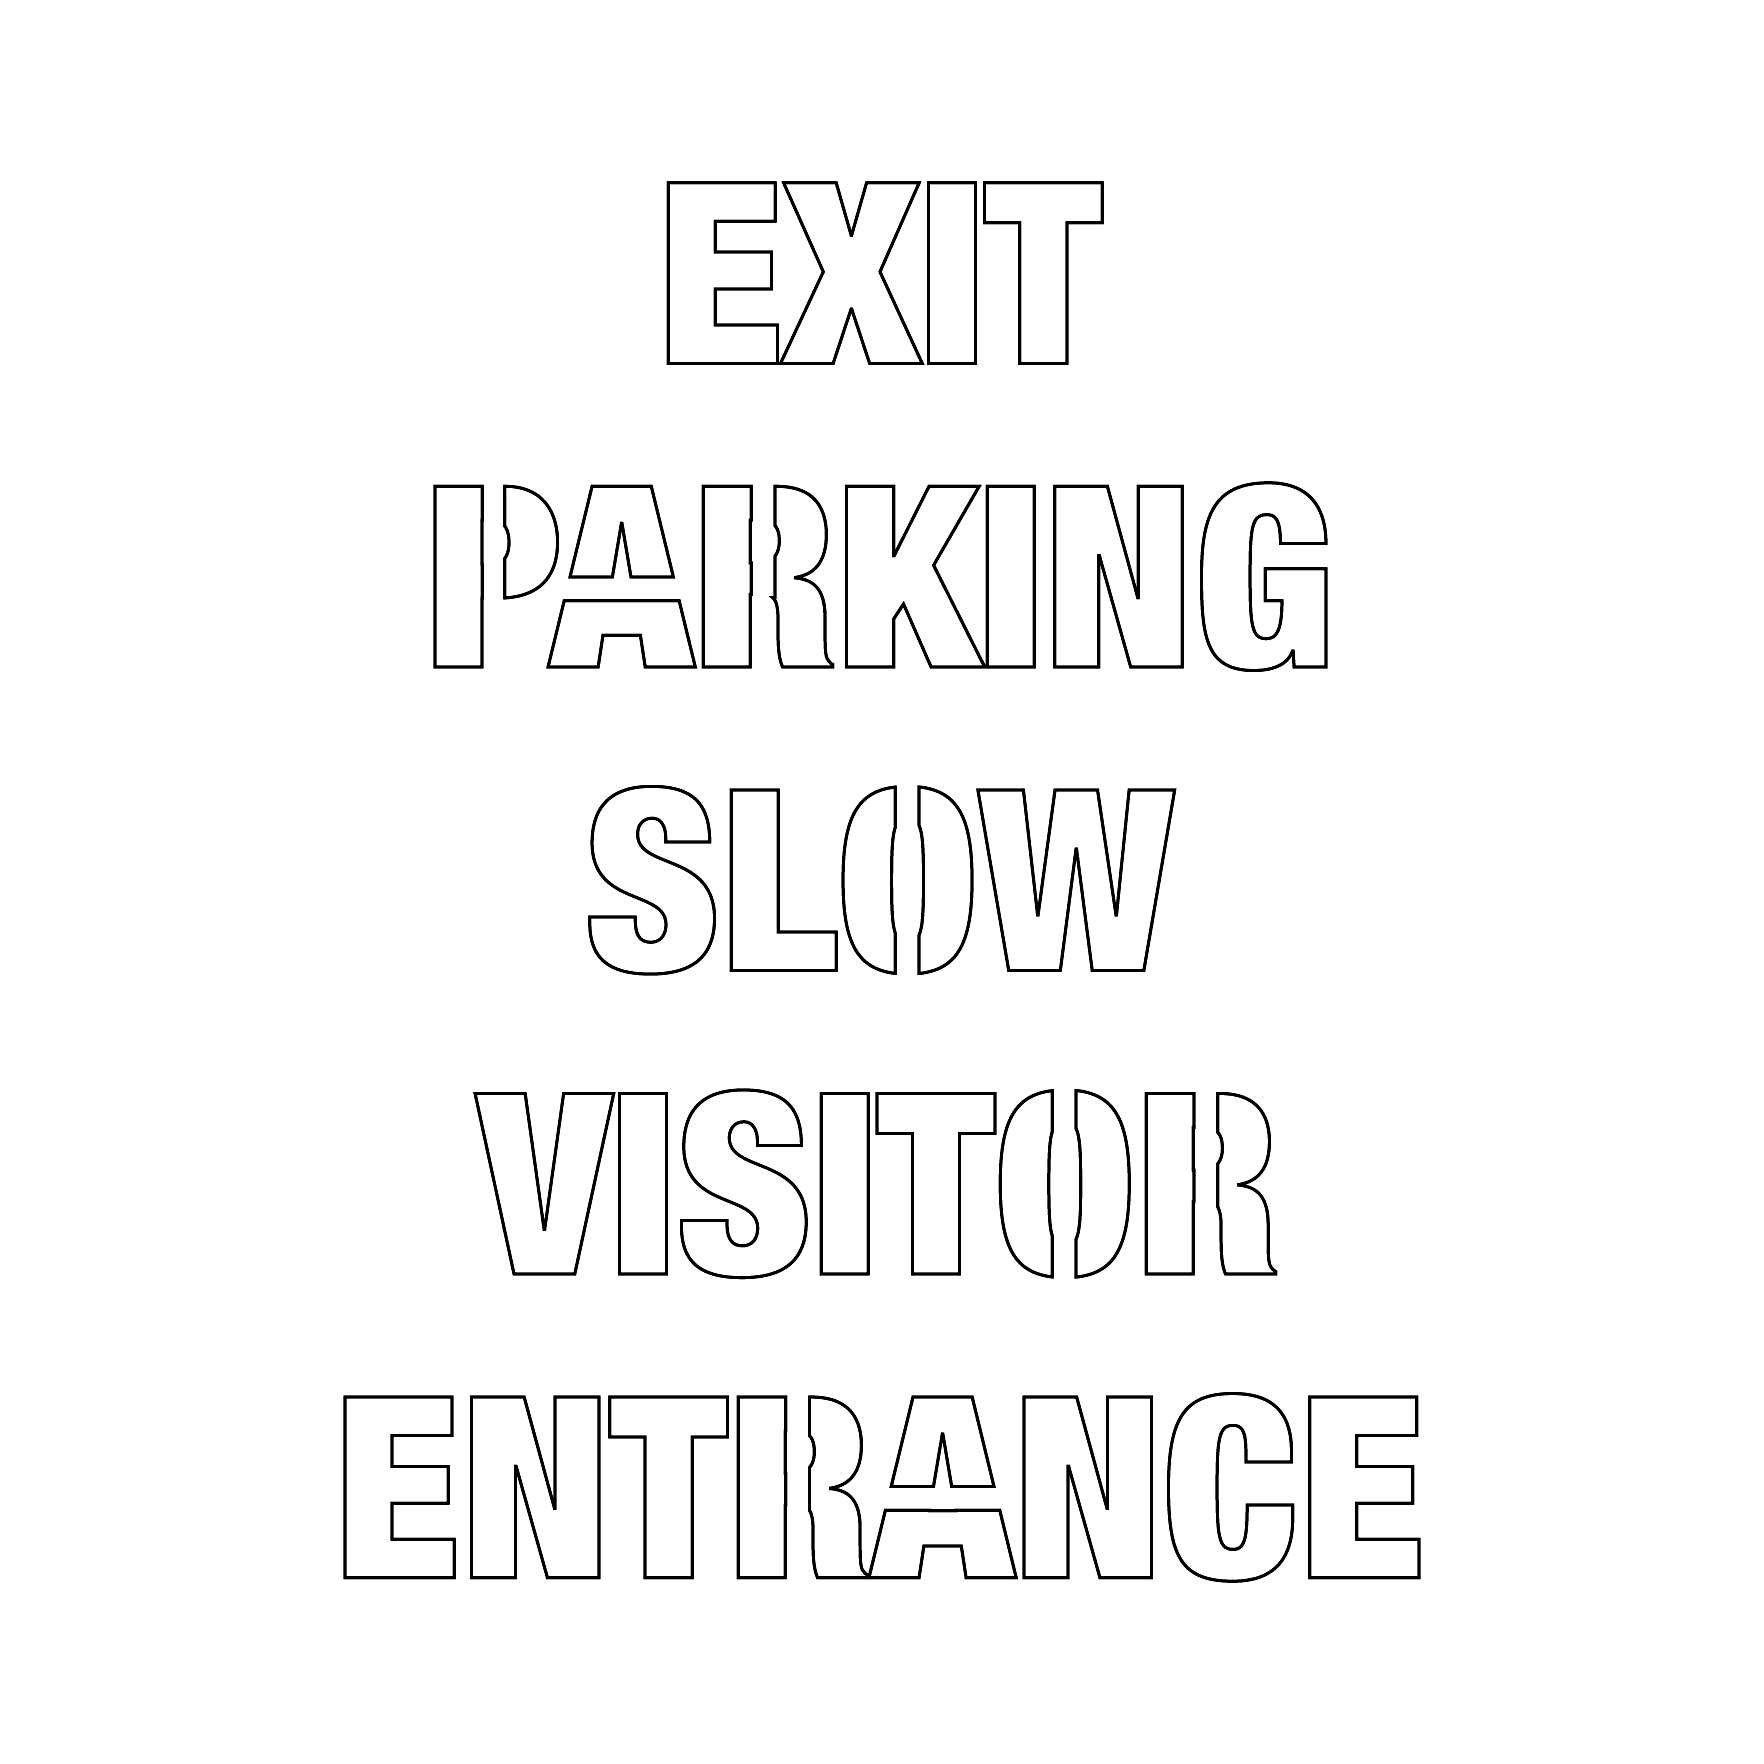 stencil-parking-entrance2.jpg